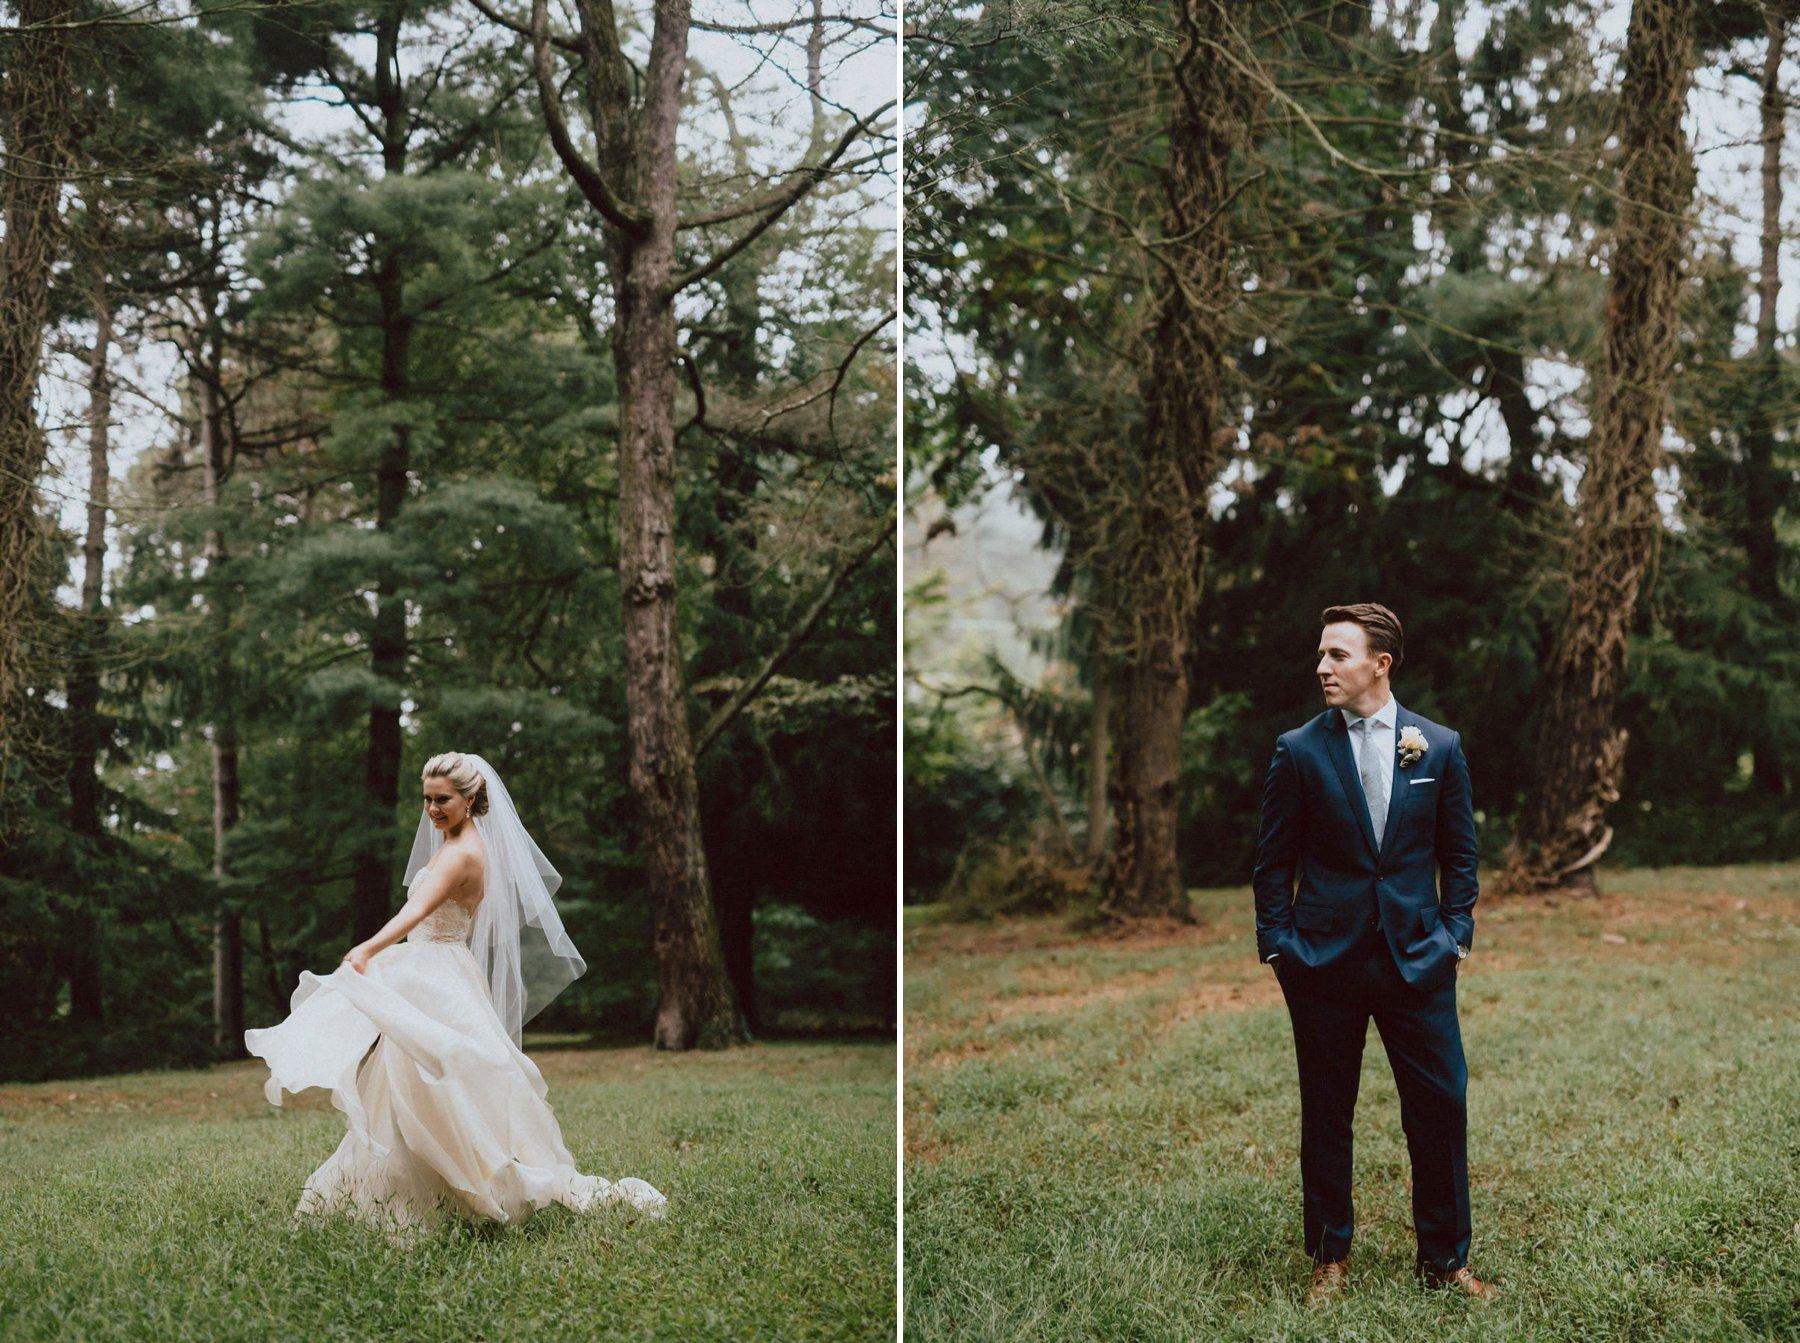 greenville-country-club-wedding-87.jpg